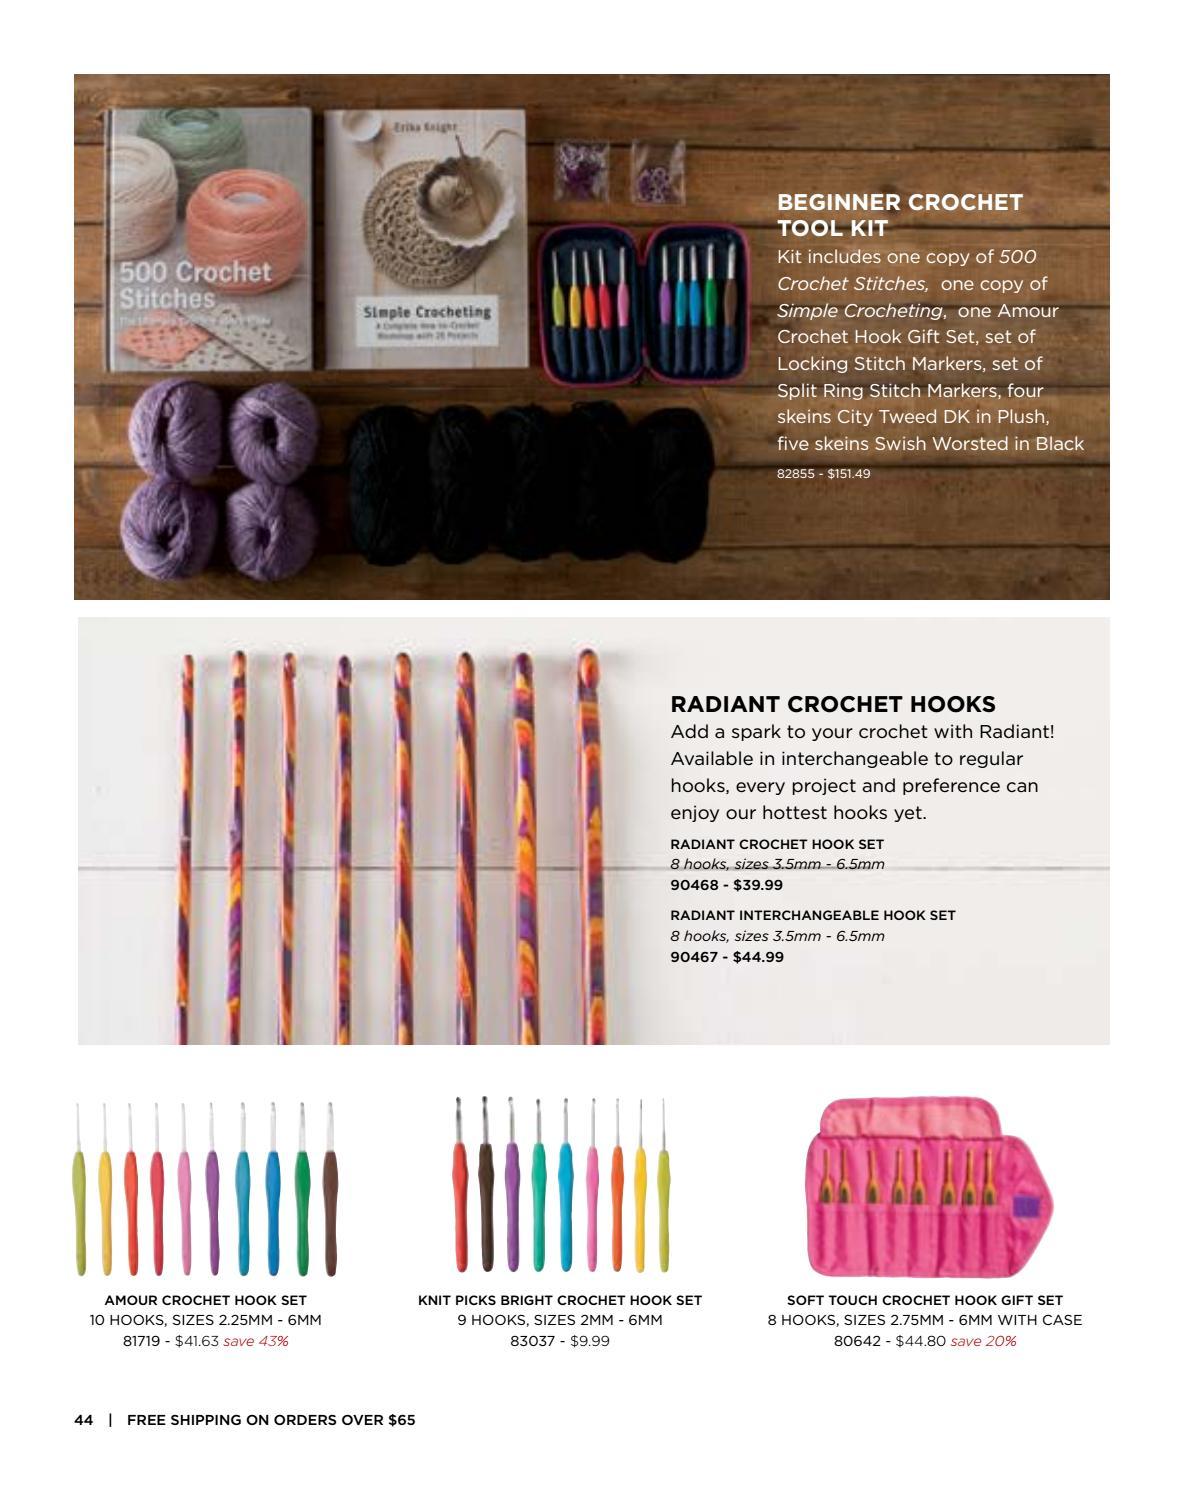 d14394f84c5af Knit Picks September 2018 Catalog by Crafts Americana Group - issuu